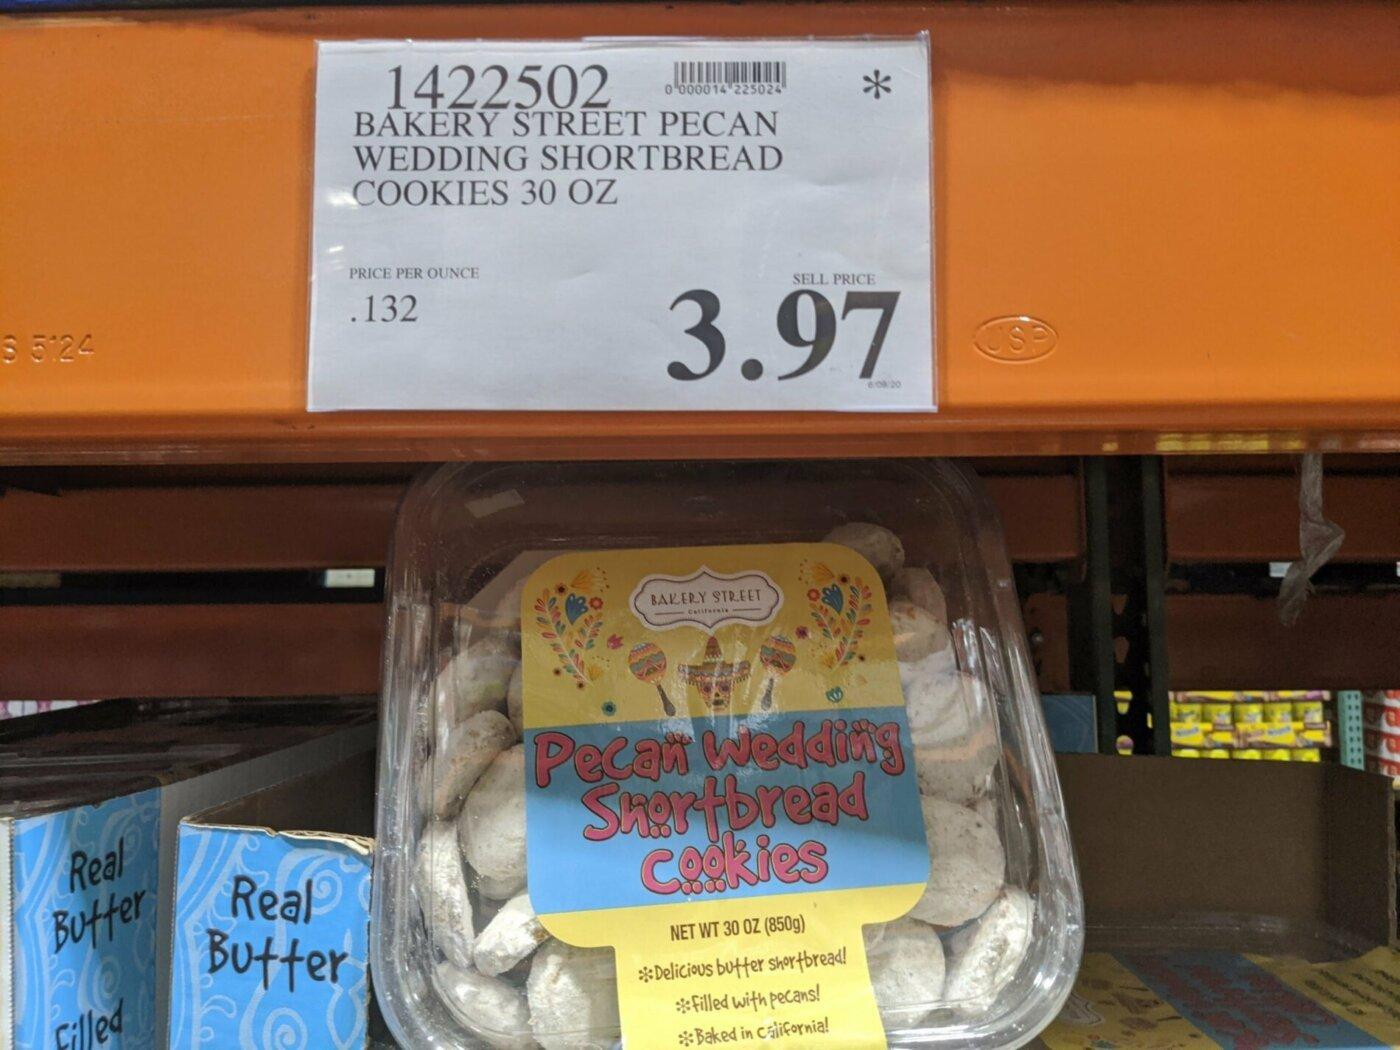 BakeryStreetPecanWeddingShortbreadCookies-1422502